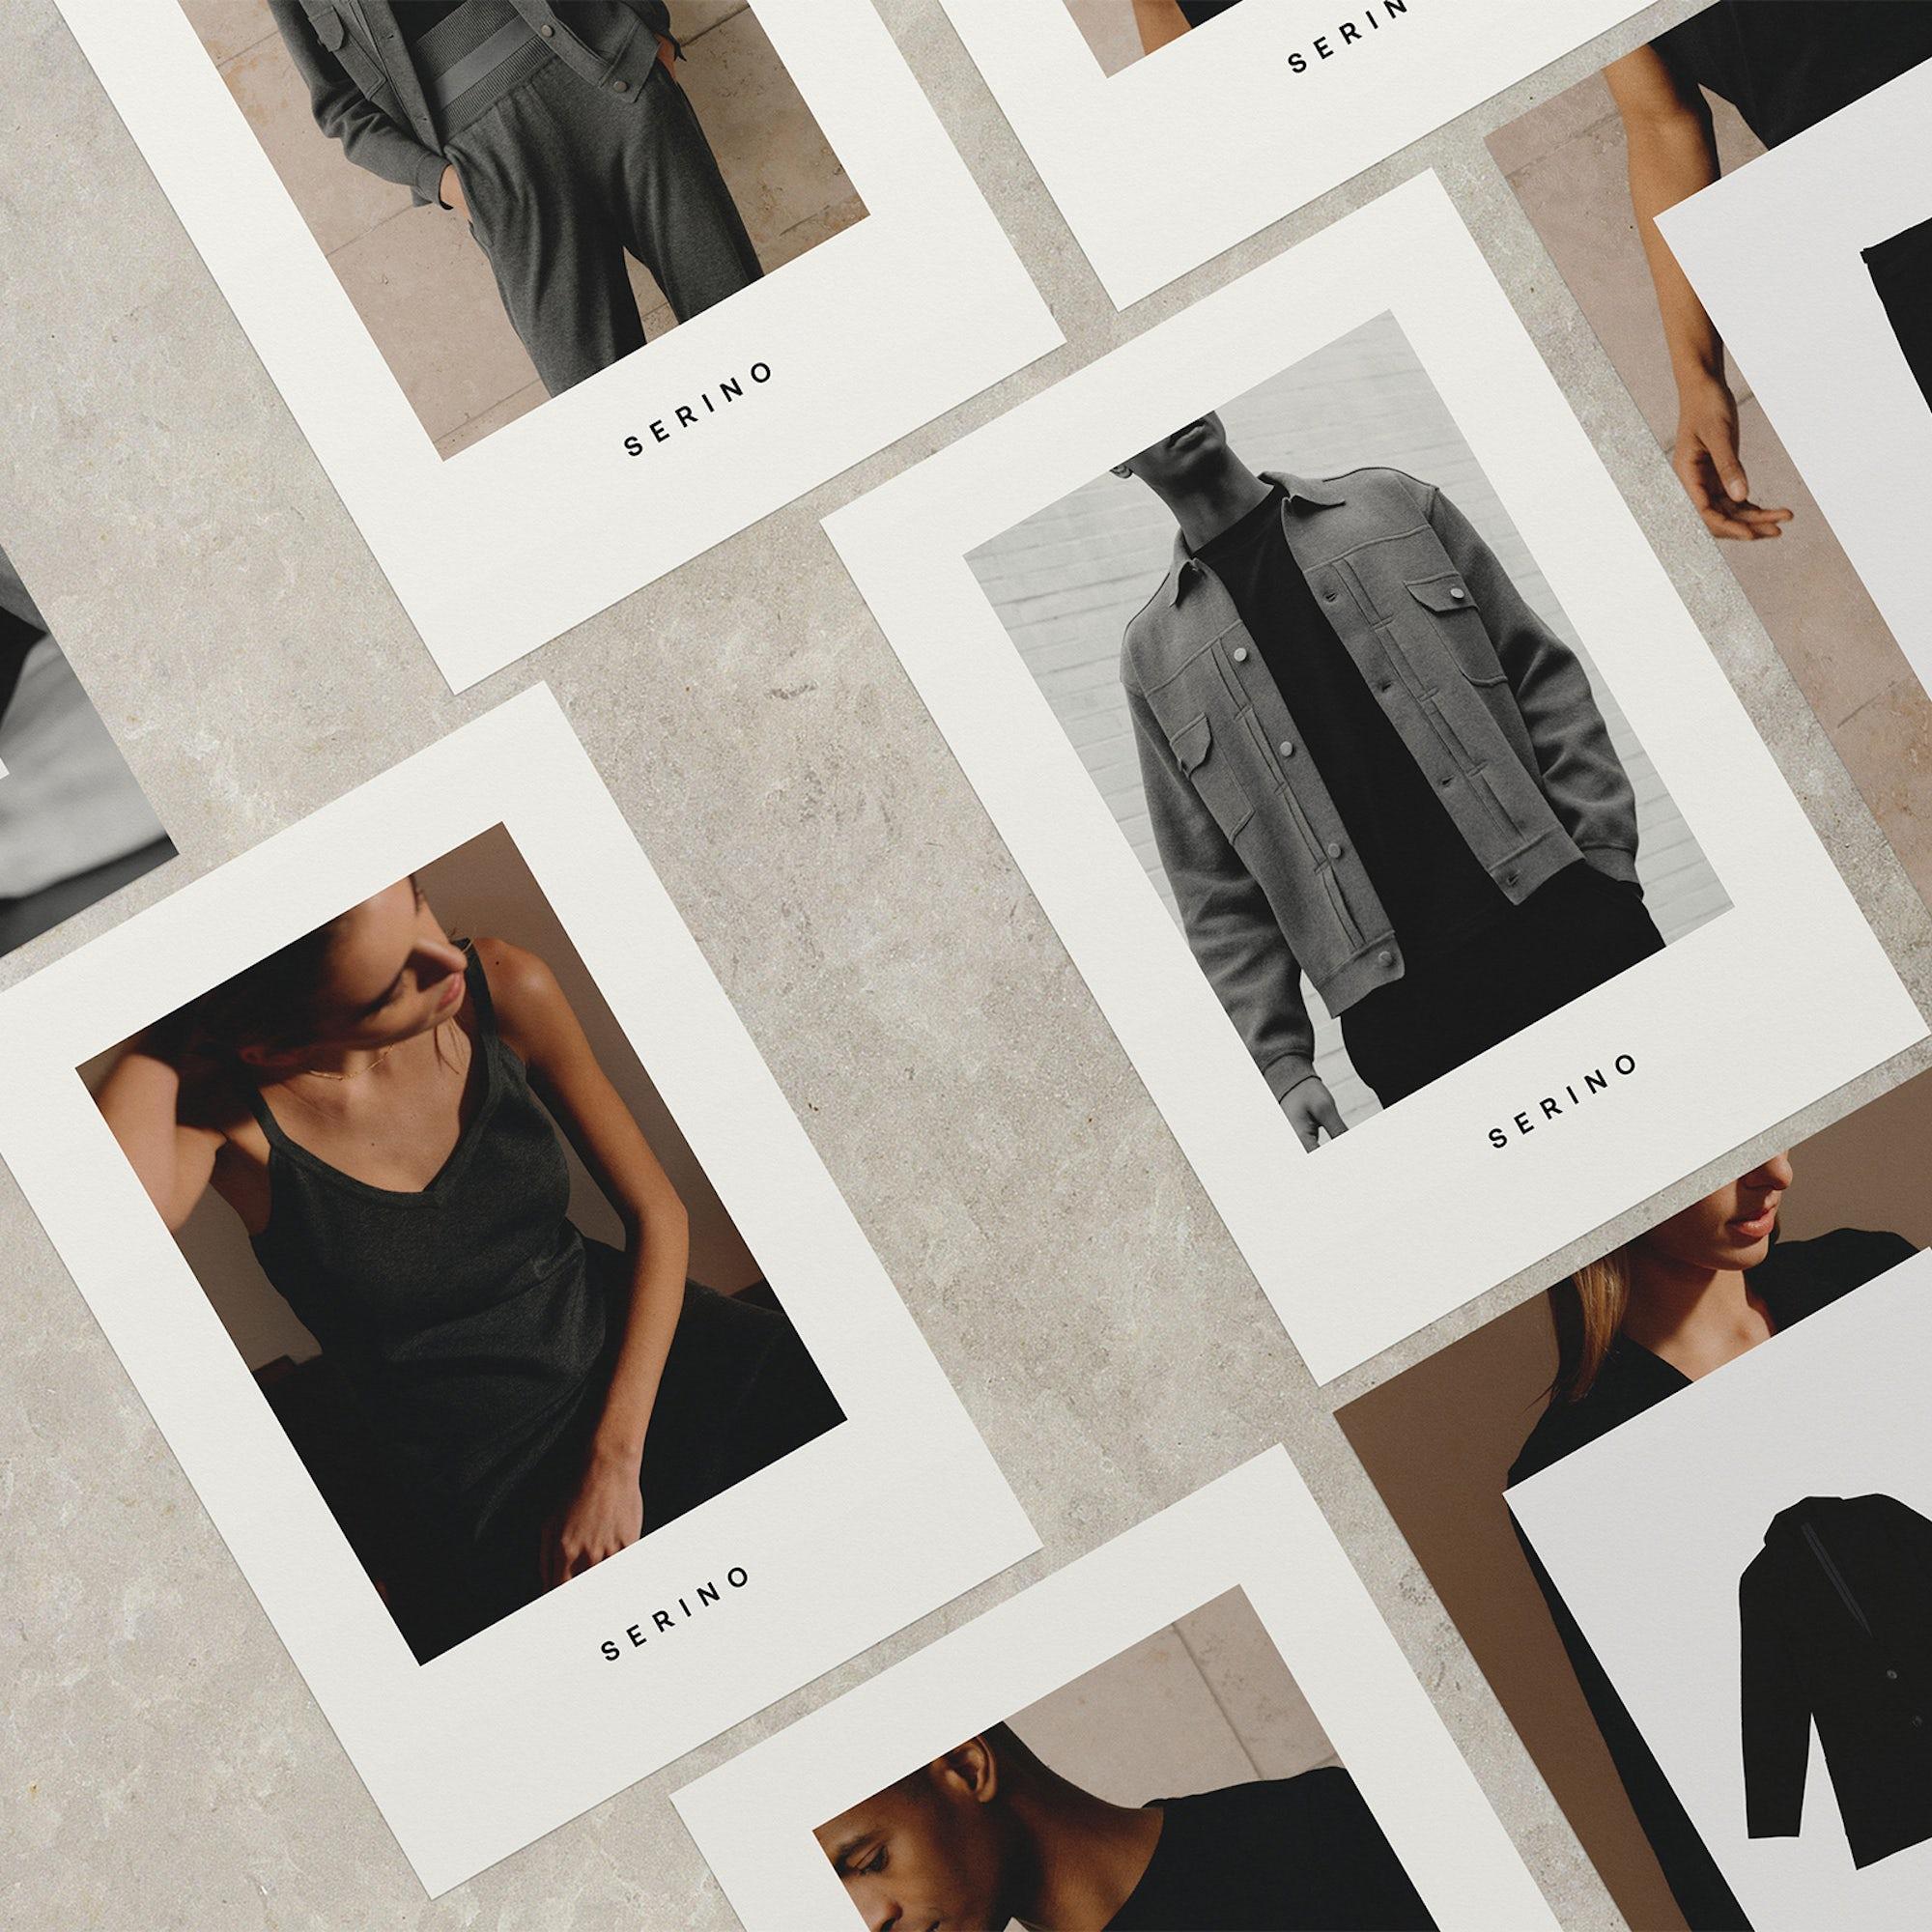 Serino Studio - Editorial Design